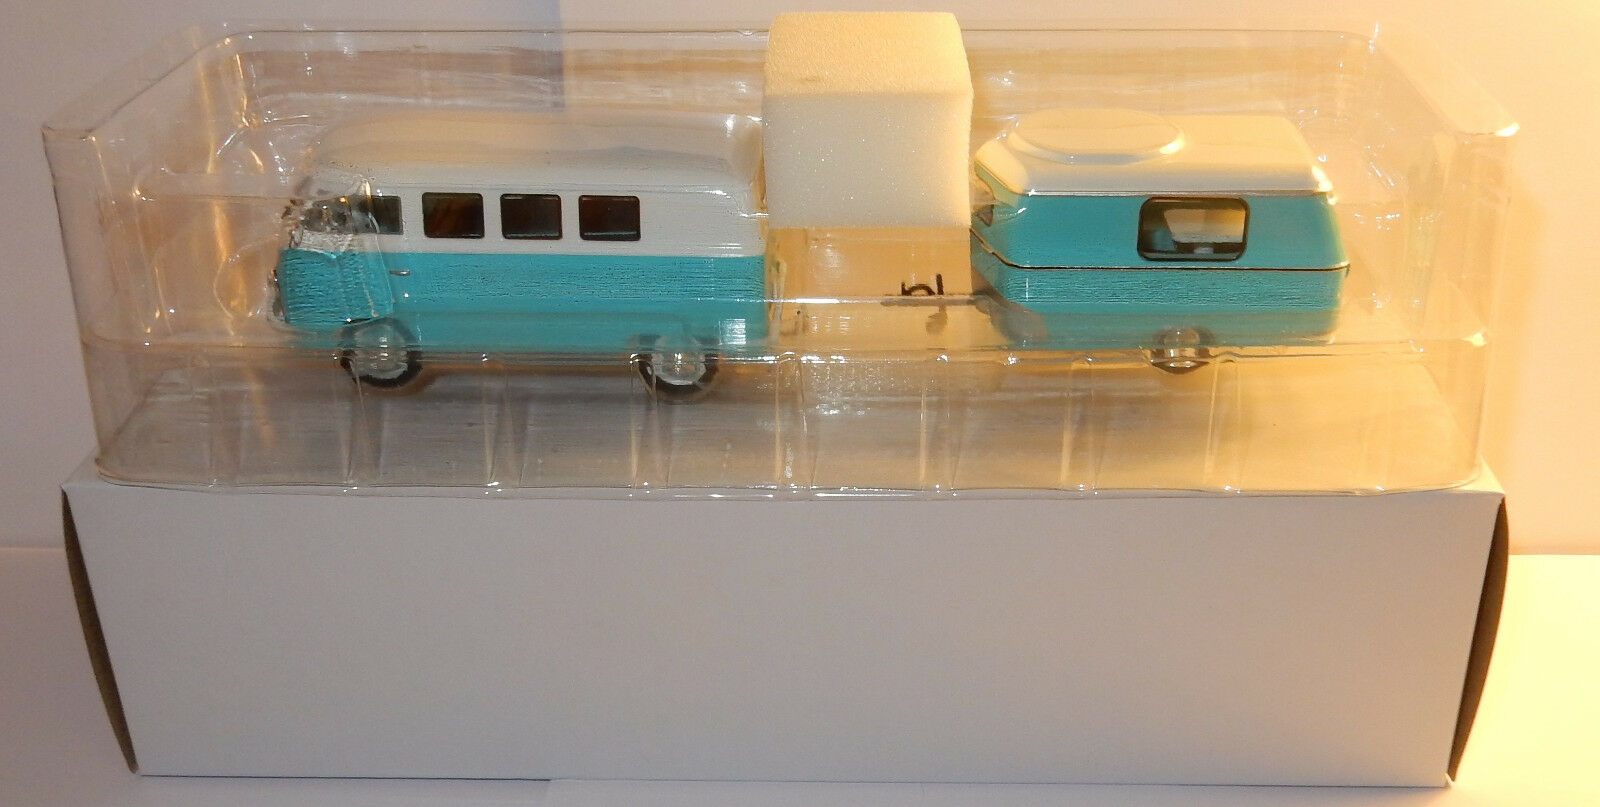 HACHETTE PASSION CAMPING-CAR 1 43 DU N°6 au N°23 avec FASCICULE in blister box